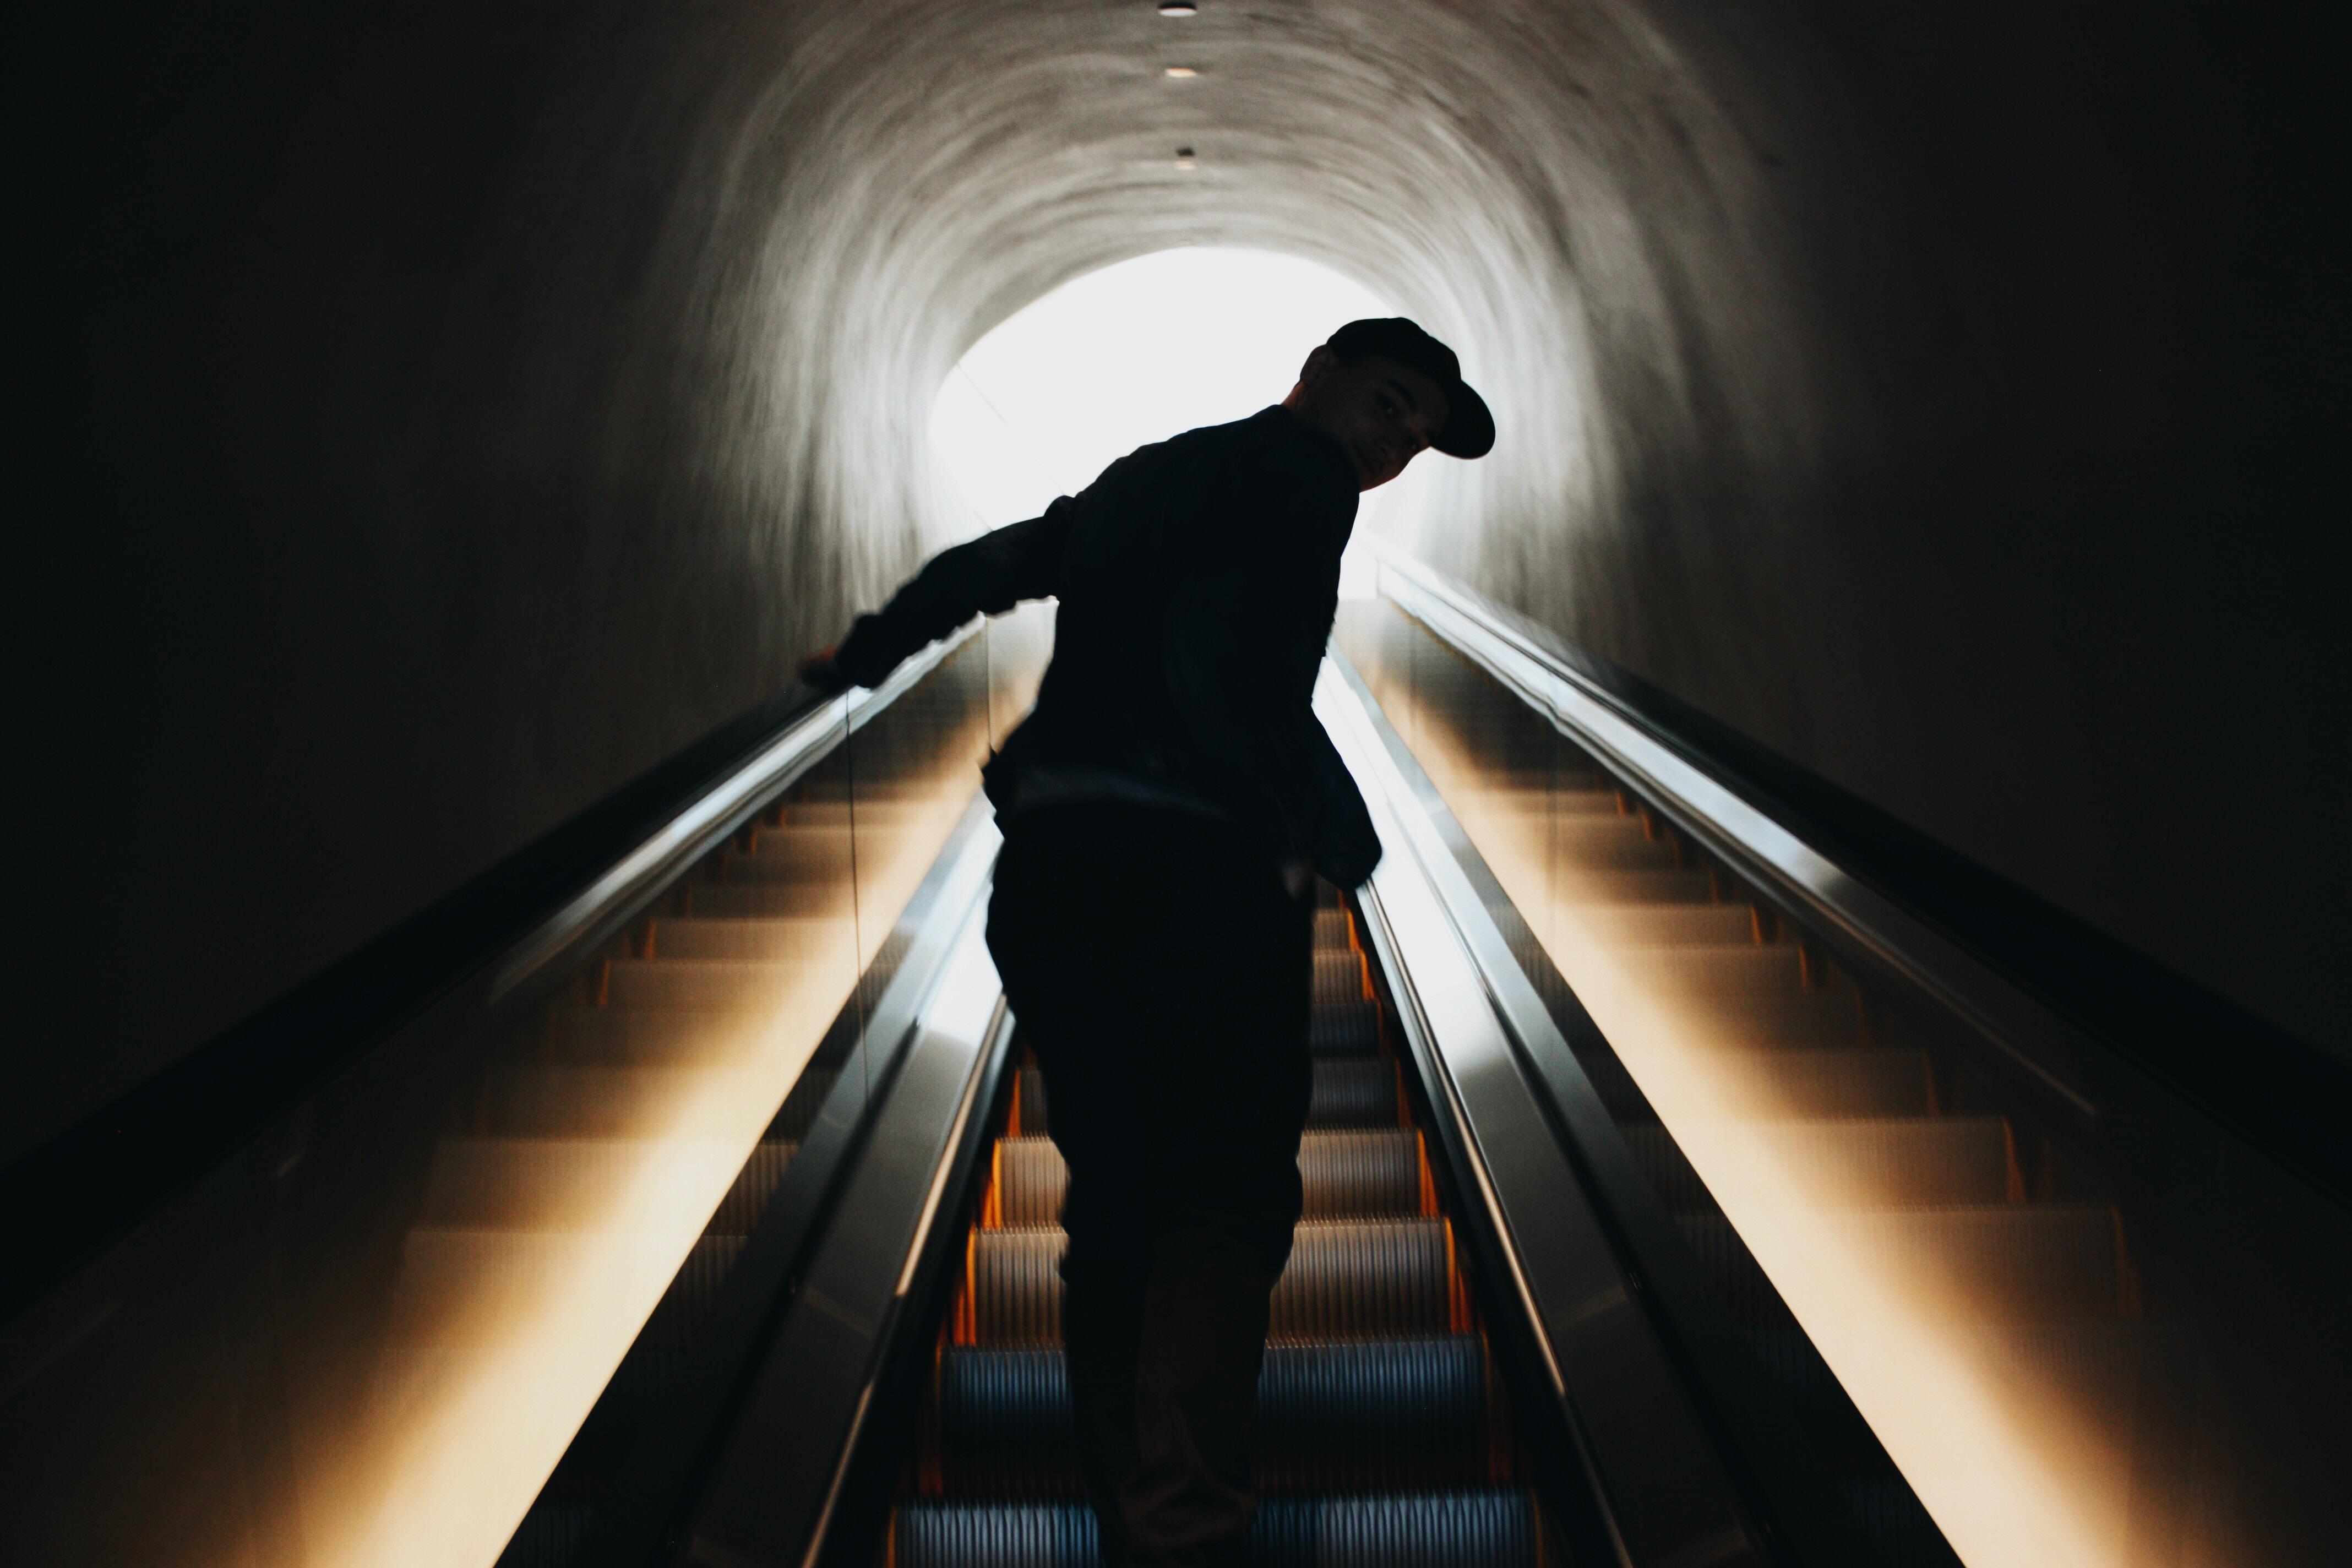 silhouette photo of man standing on escalator